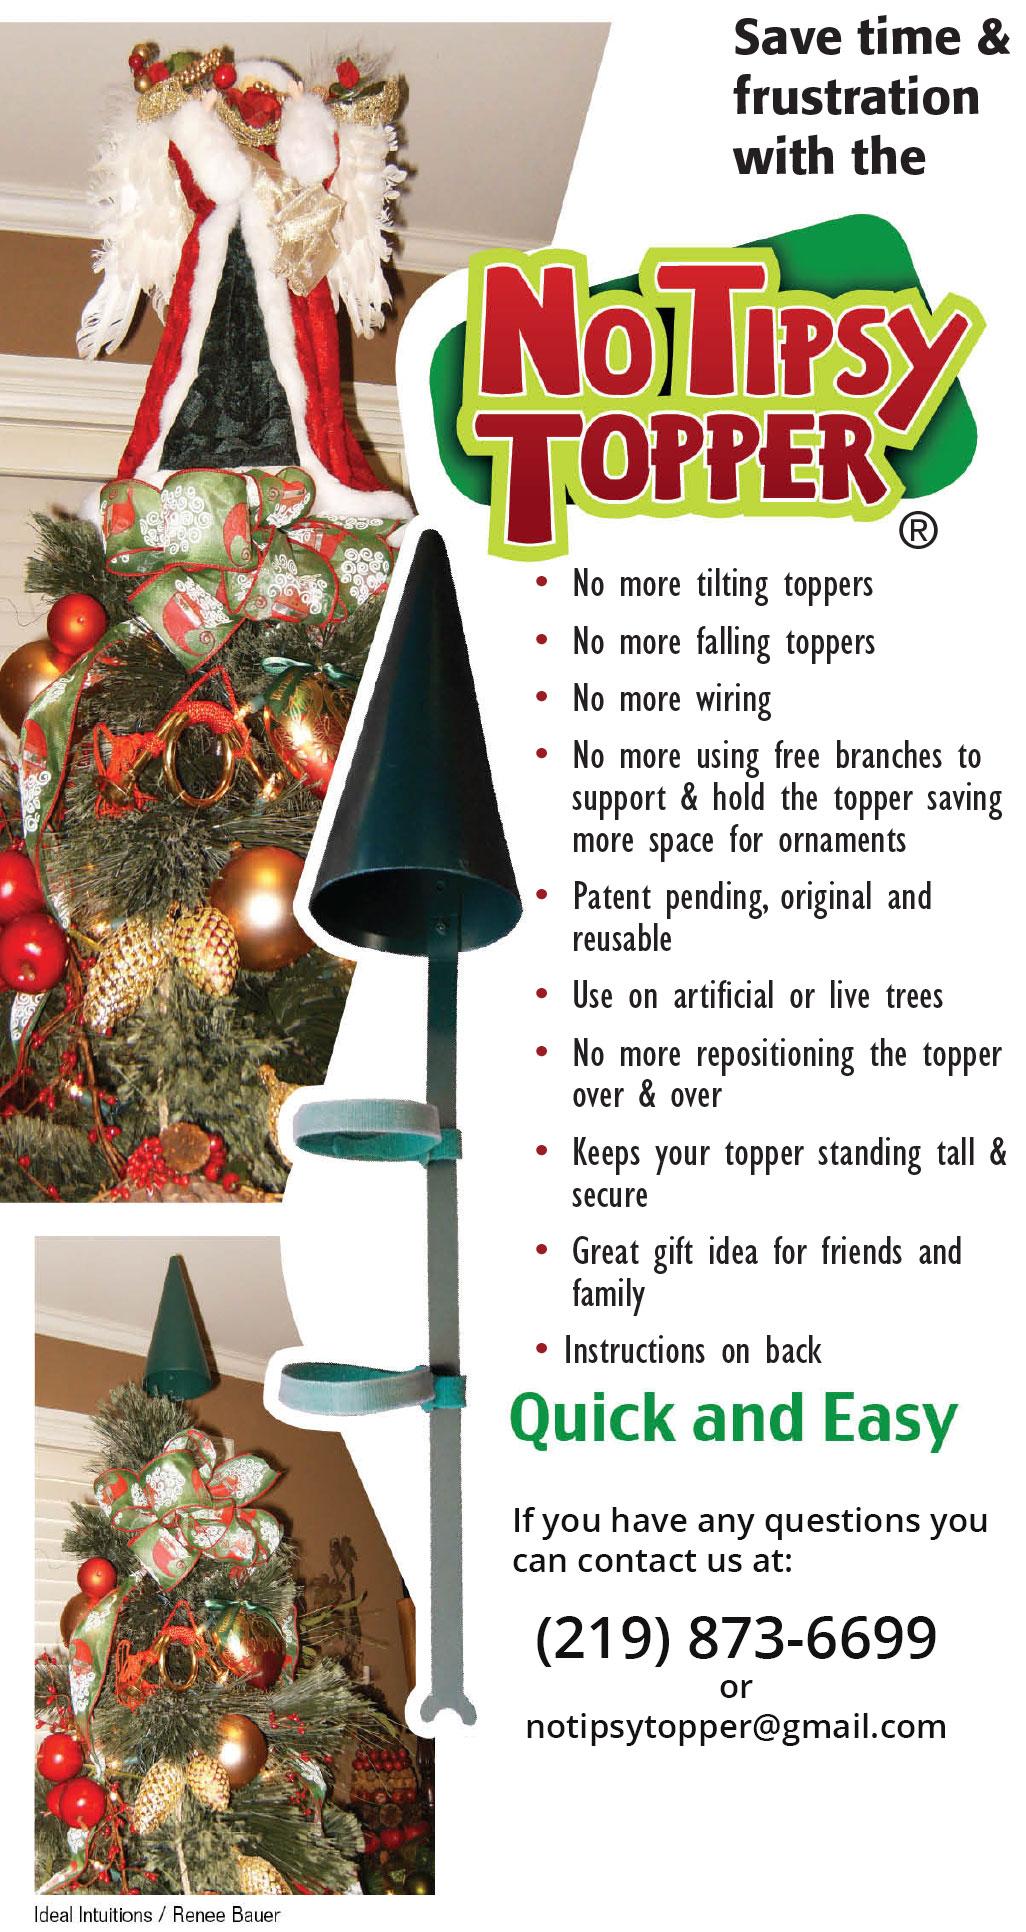 Steve Harvey Christmas Tree.Christmas Tree Topper Tipsy Topper Style 1 As Seen On